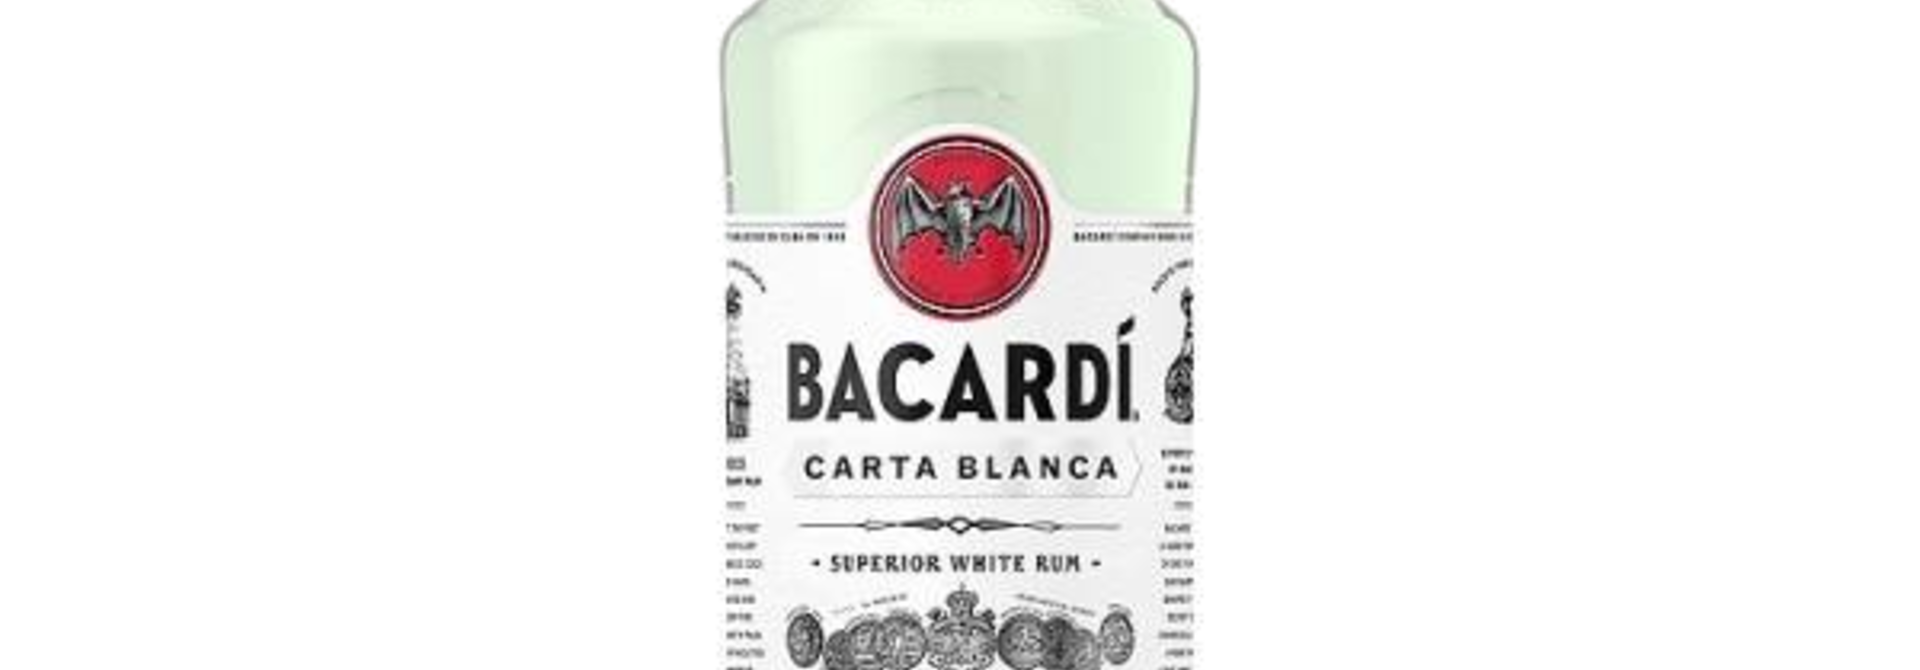 BACARDI Carta Blanca 1.0ltr